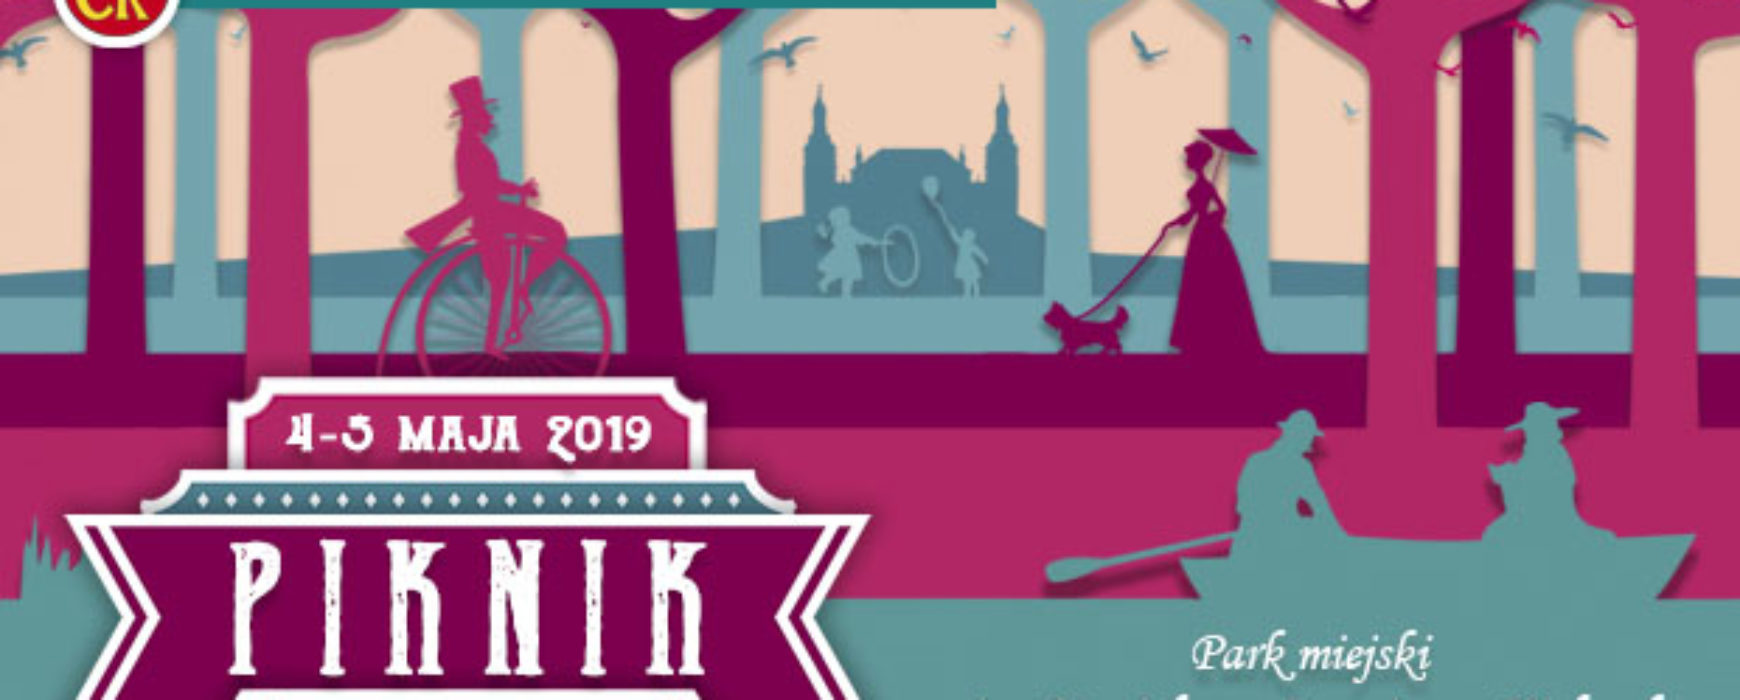 Piknik – Retro Kielce